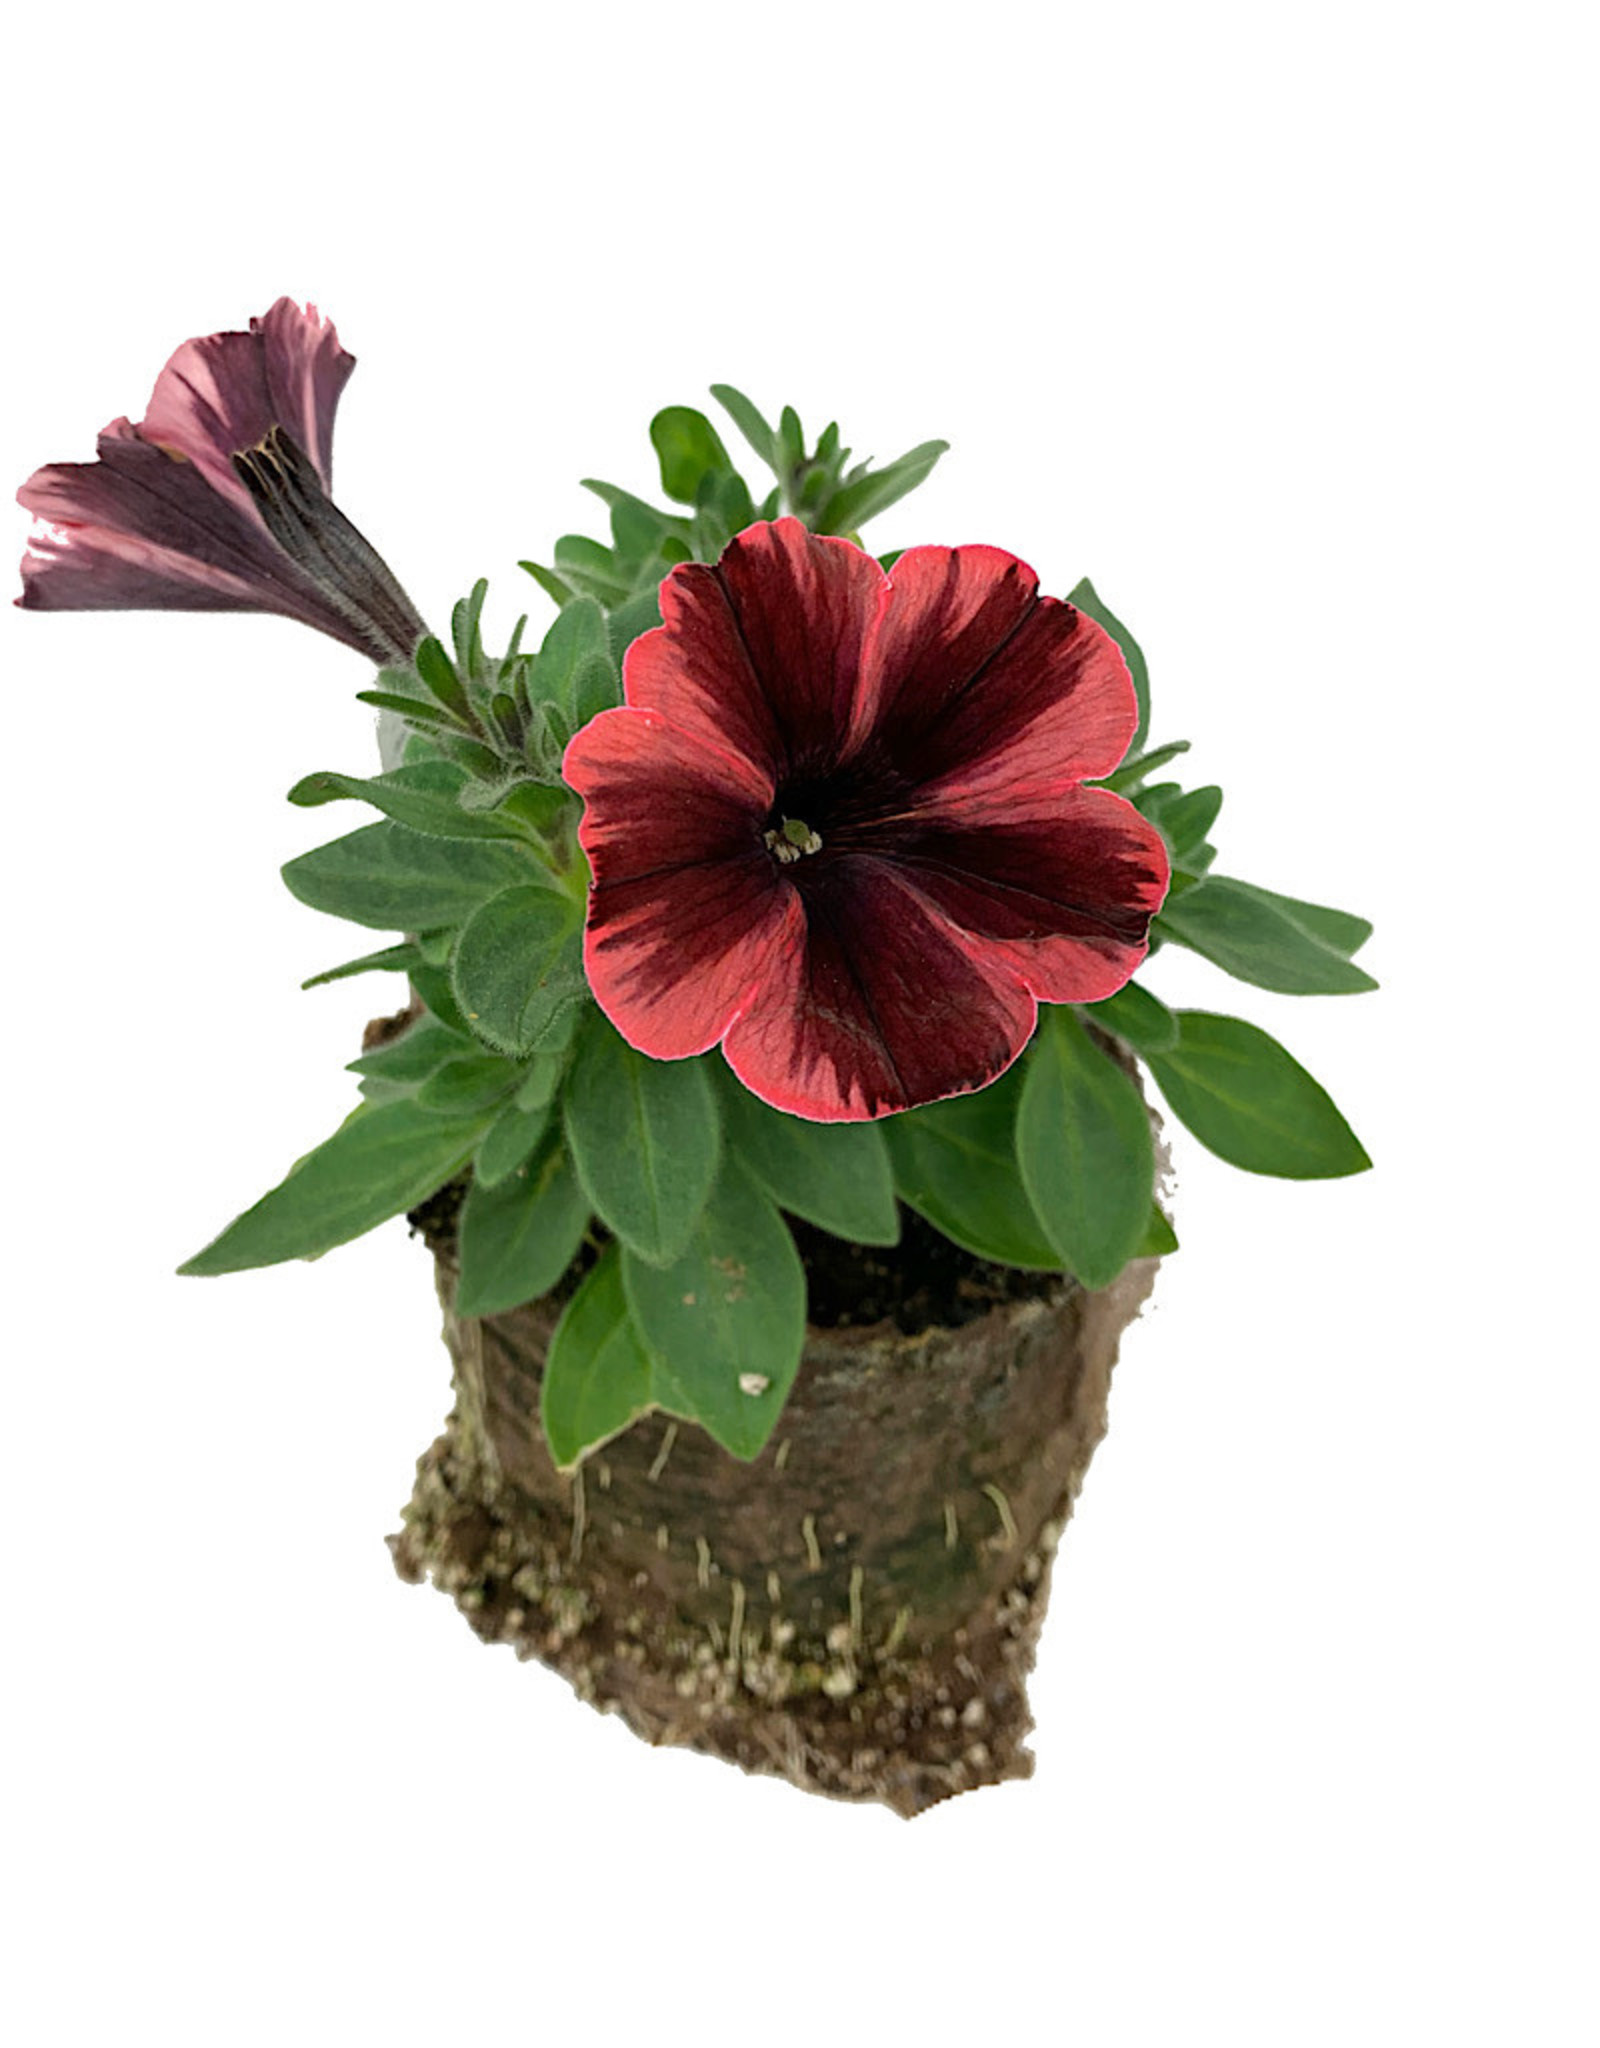 Petunia 'Sweetunia Fiona Flash' - 4 inch